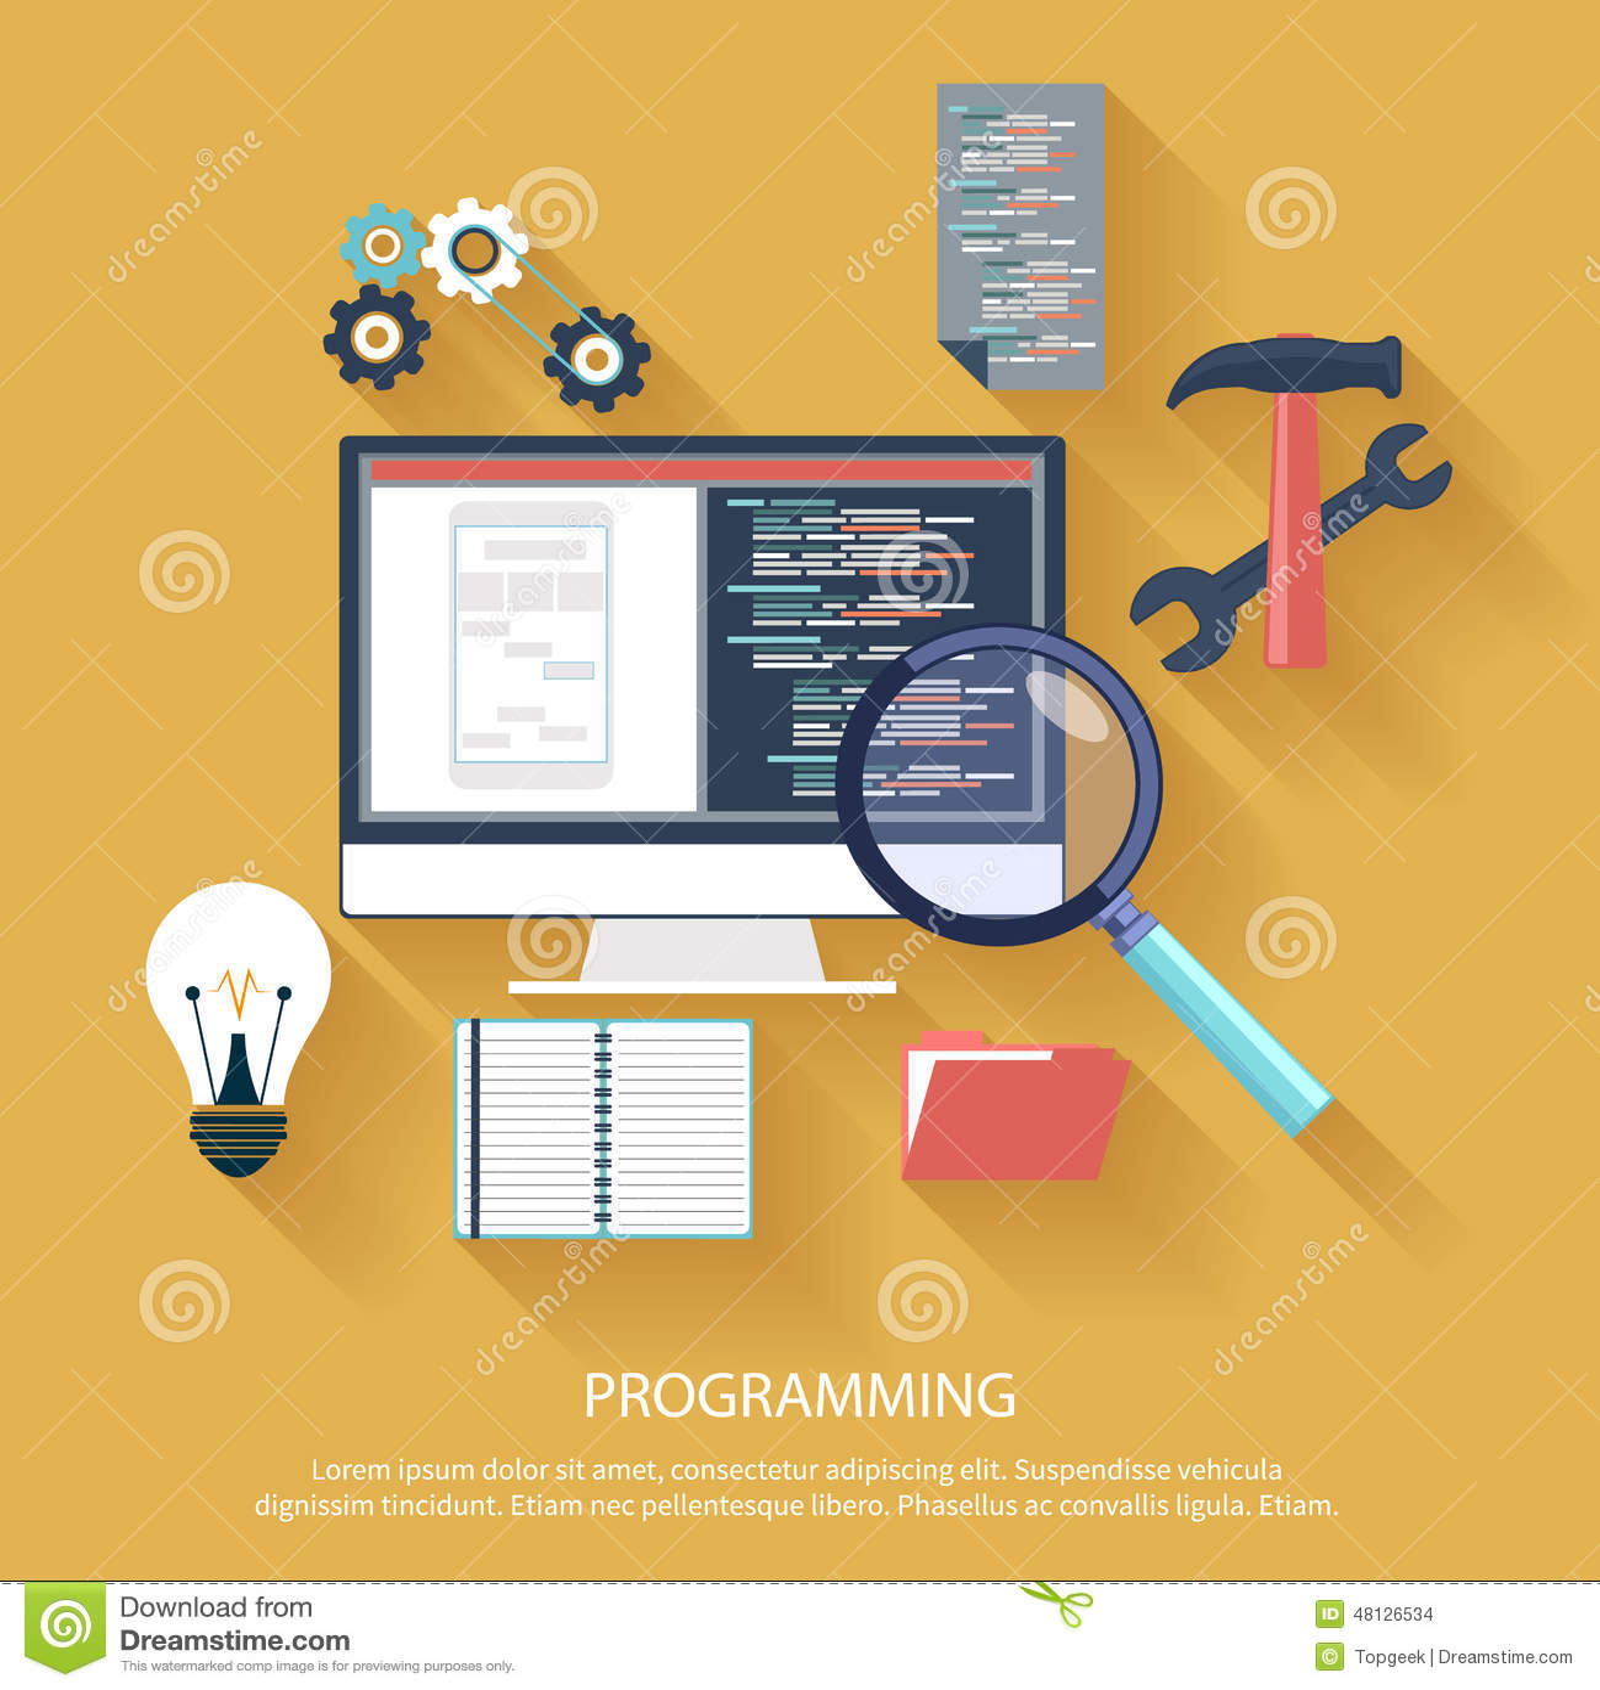 Programming Concept Stock Vector Image 48126534